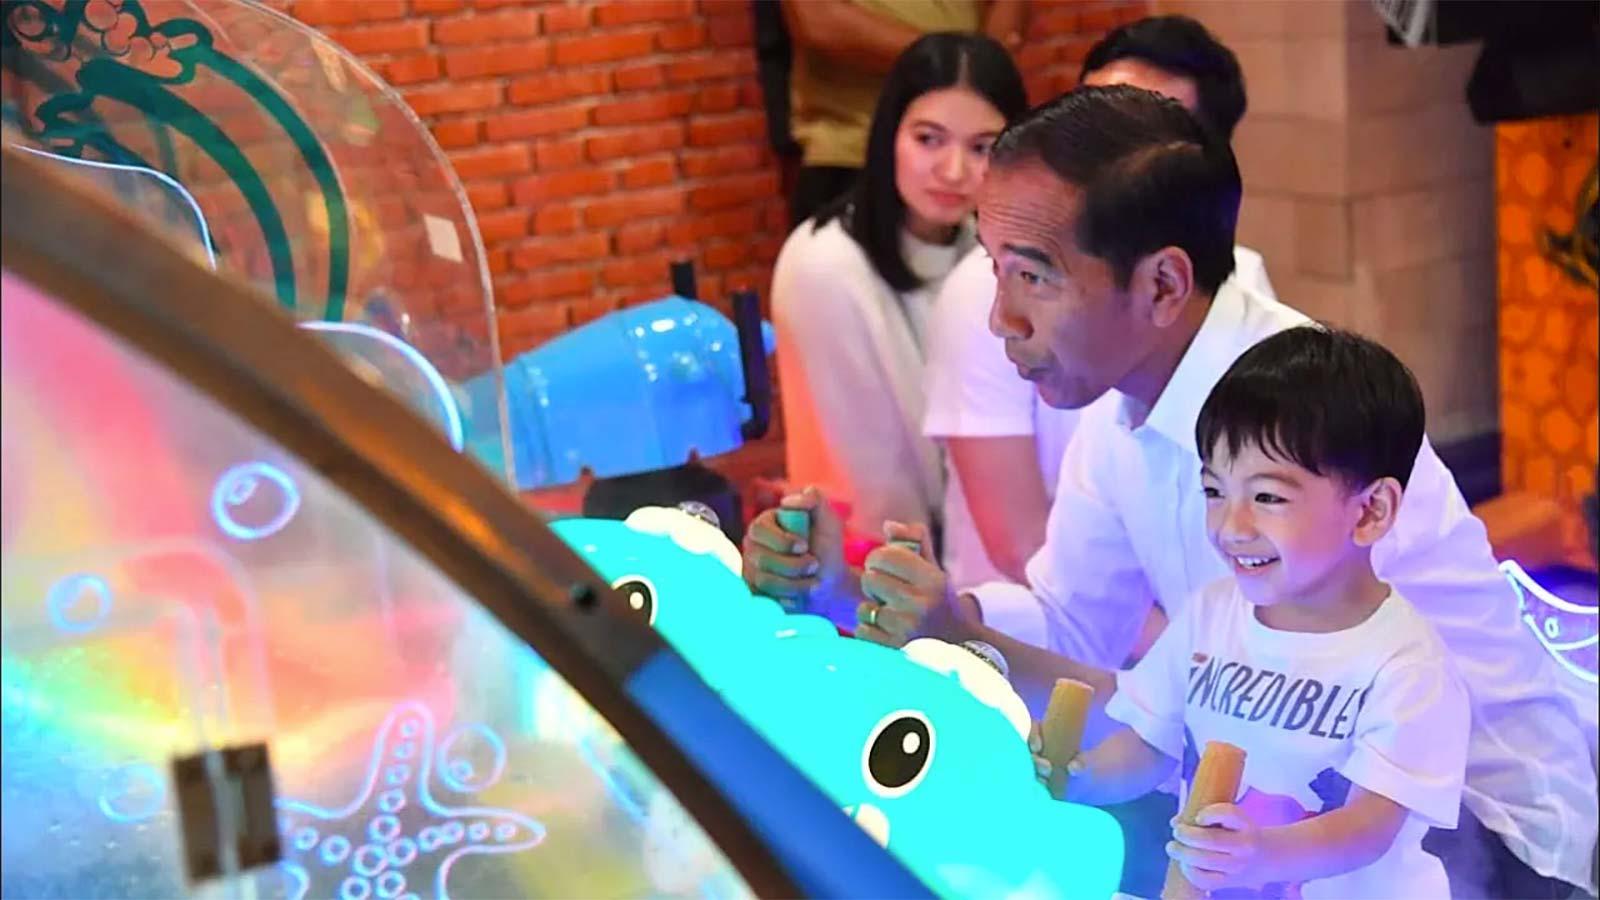 Joko Widodo and three-year-old grandson Jan Ethes at the shopping mall (Photo: Sekretariat Presiden/YouTube)